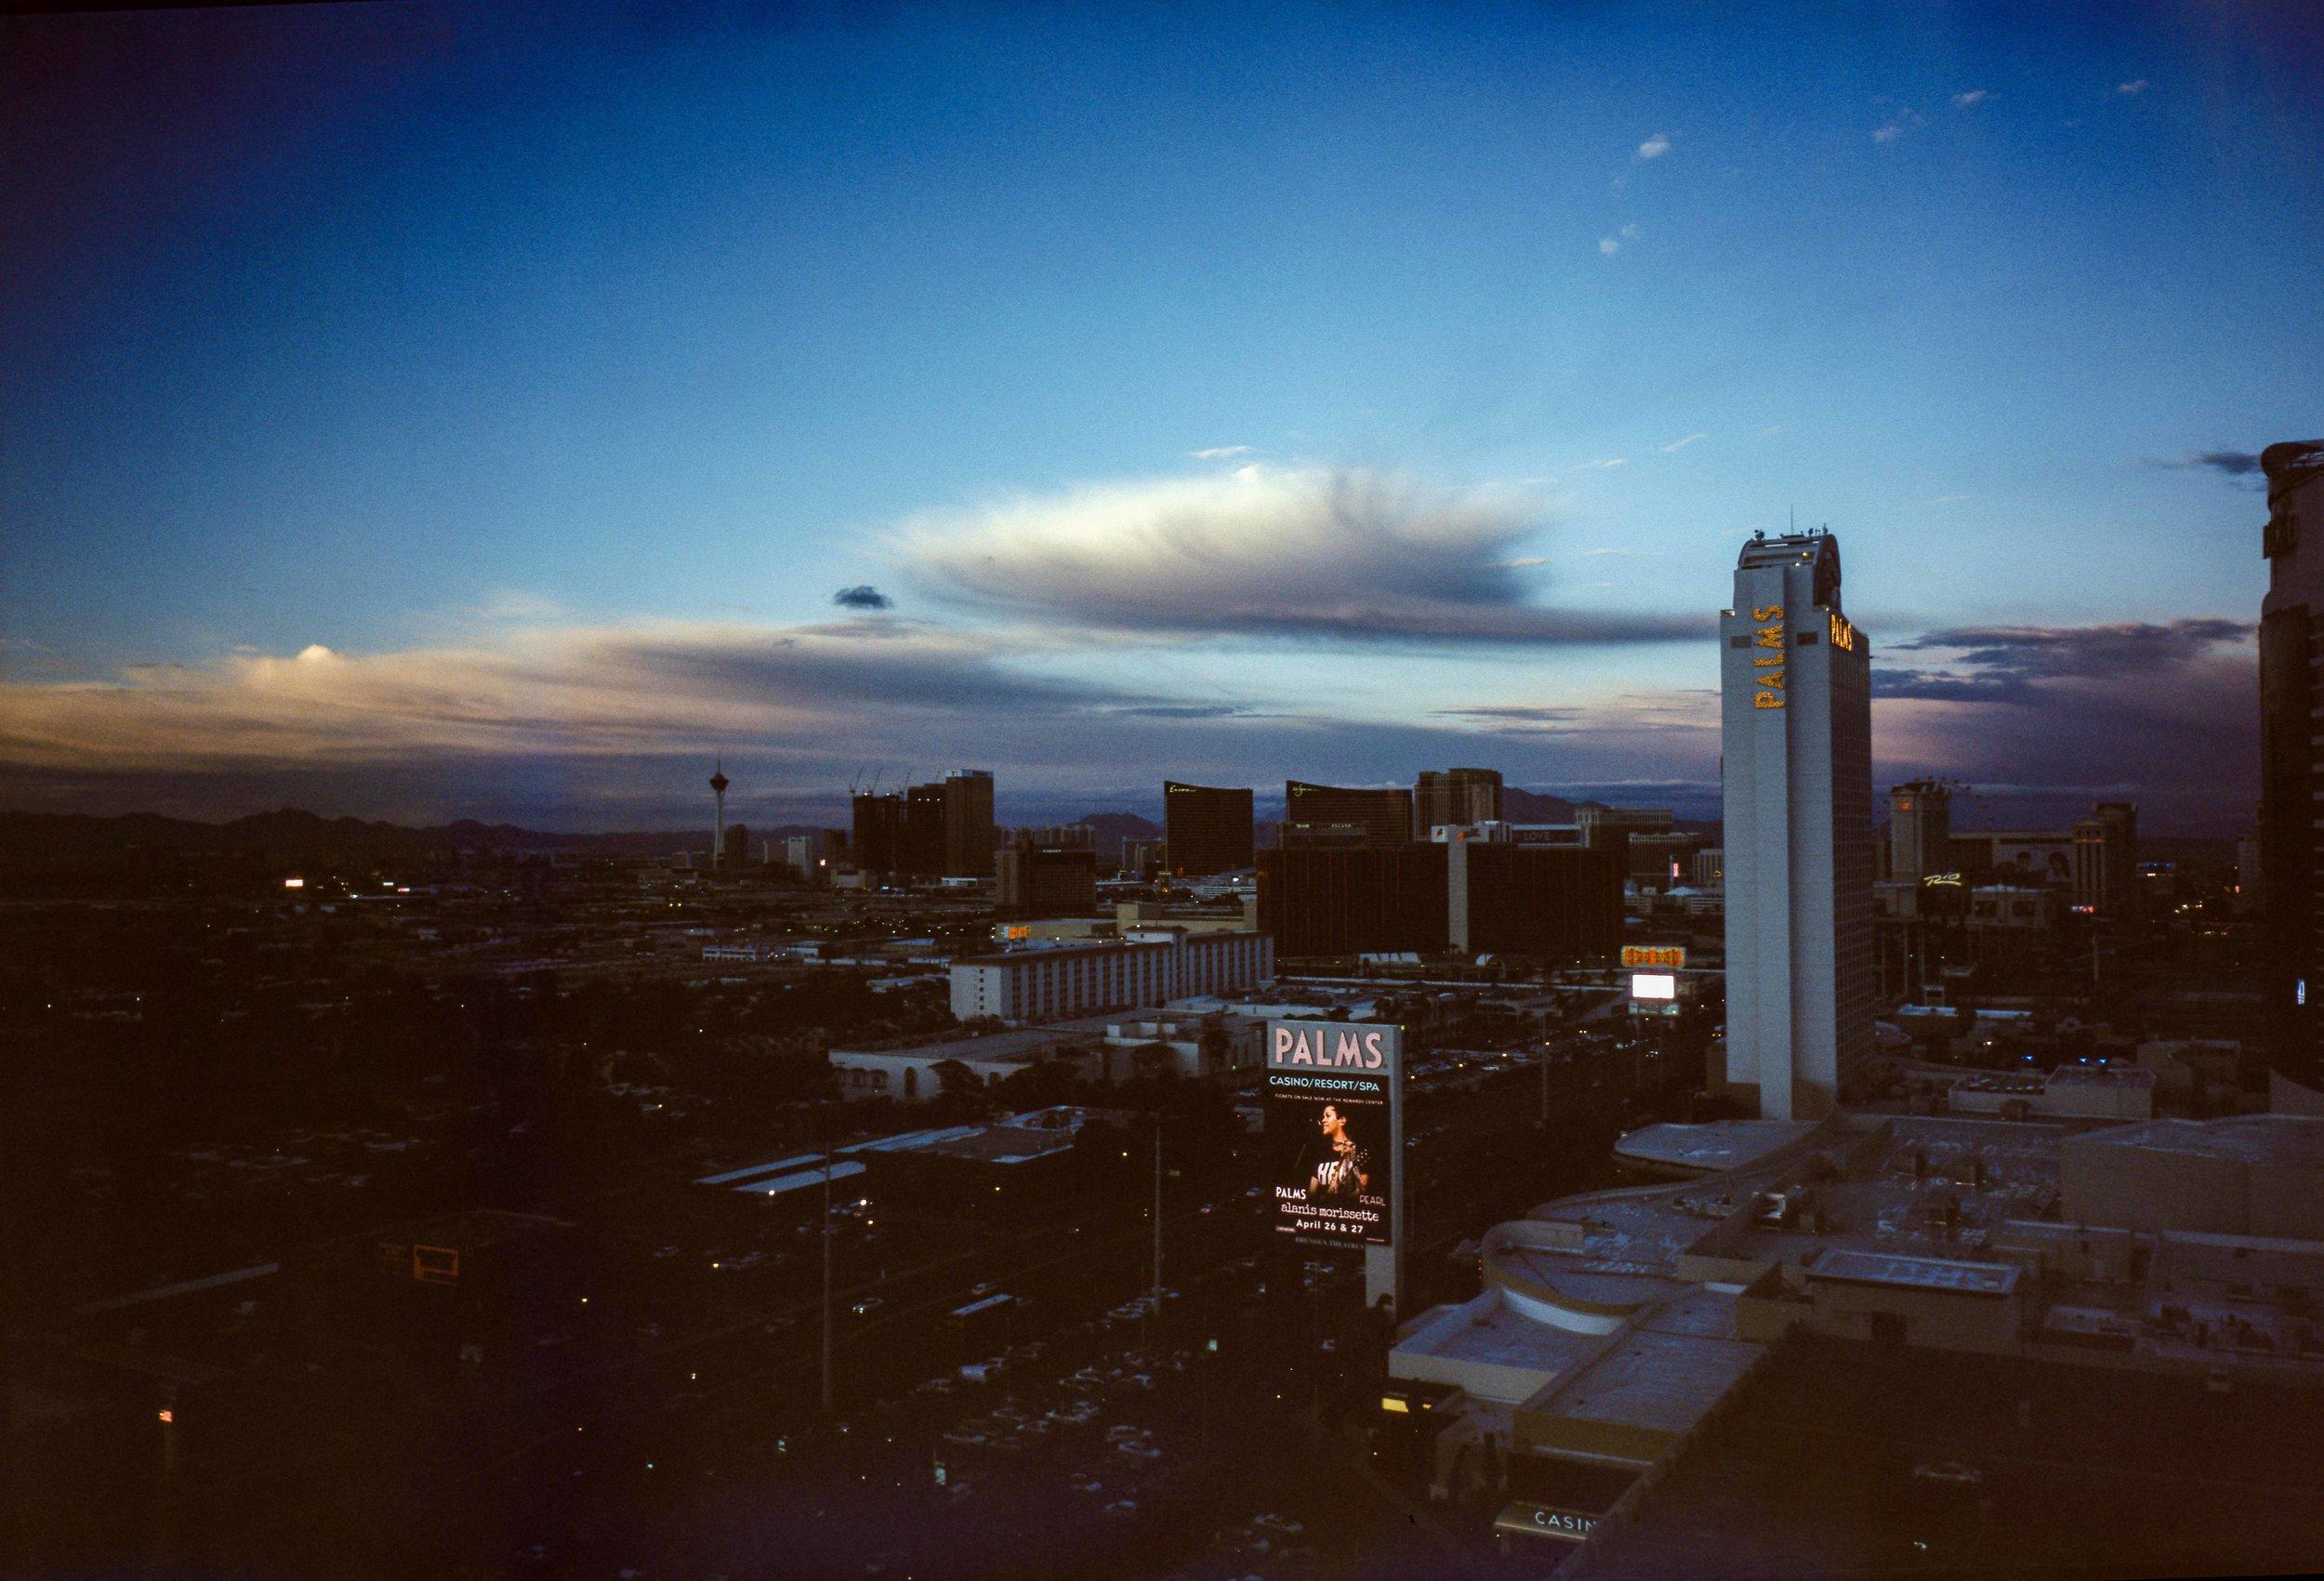 Looking towards the Vegas Strip at dusk  -   shot on Fuji Velvia Color Reversal Film